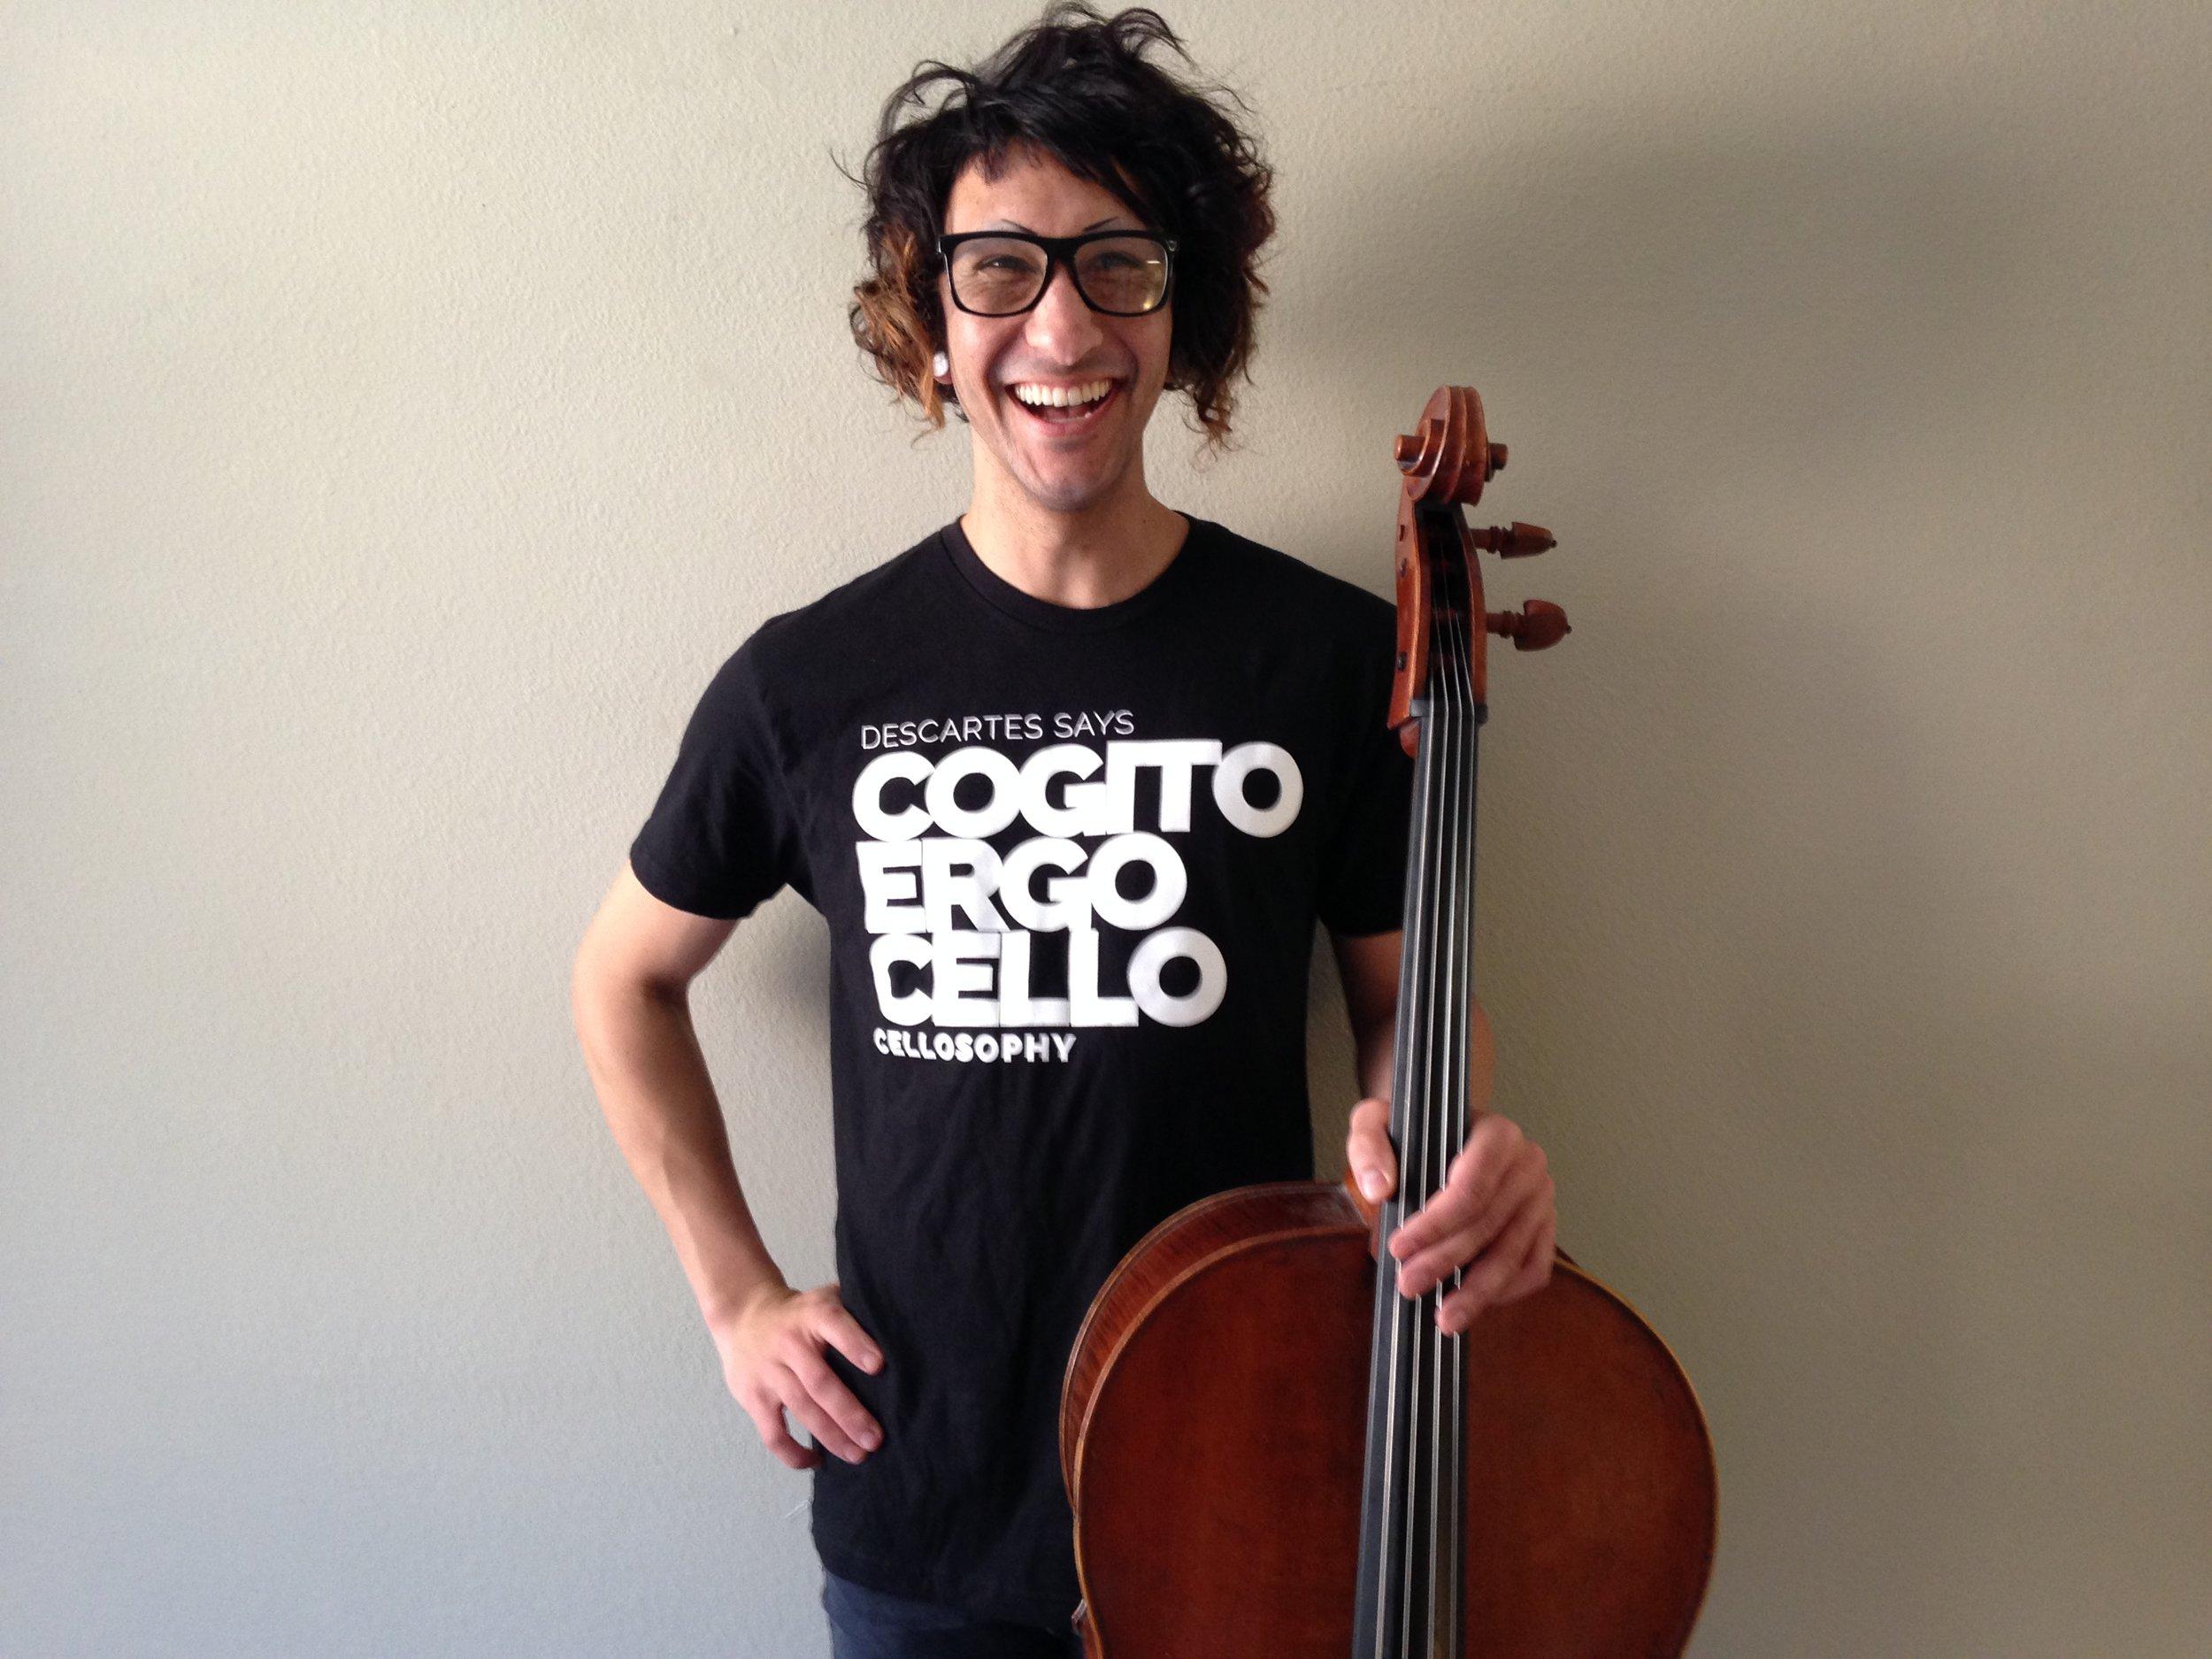 Quite A Dapper Cellosopher